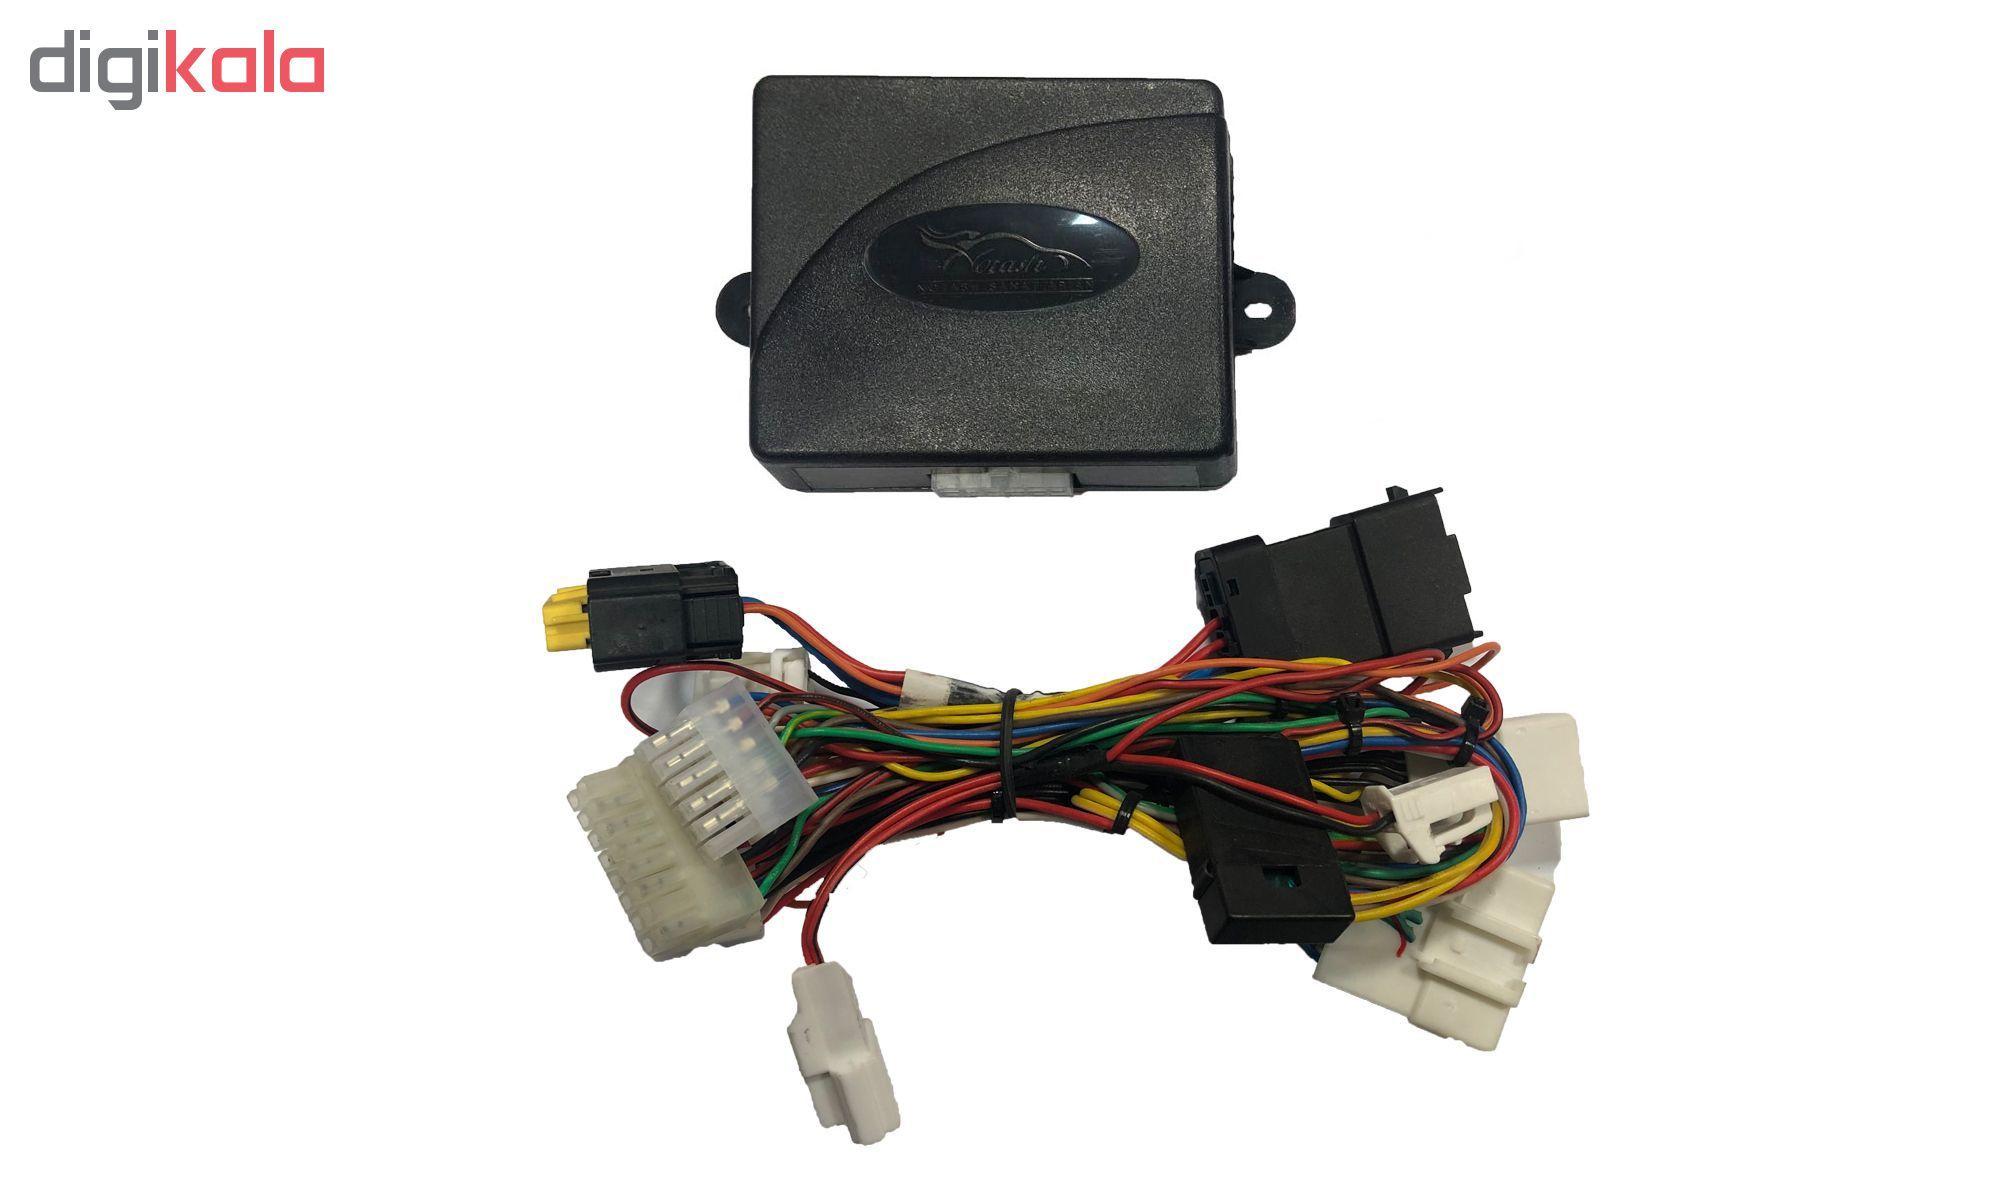 پاور ویندوز نوتاش کد NSA-PO مناسب خودرو جک S5 اتومات main 1 3